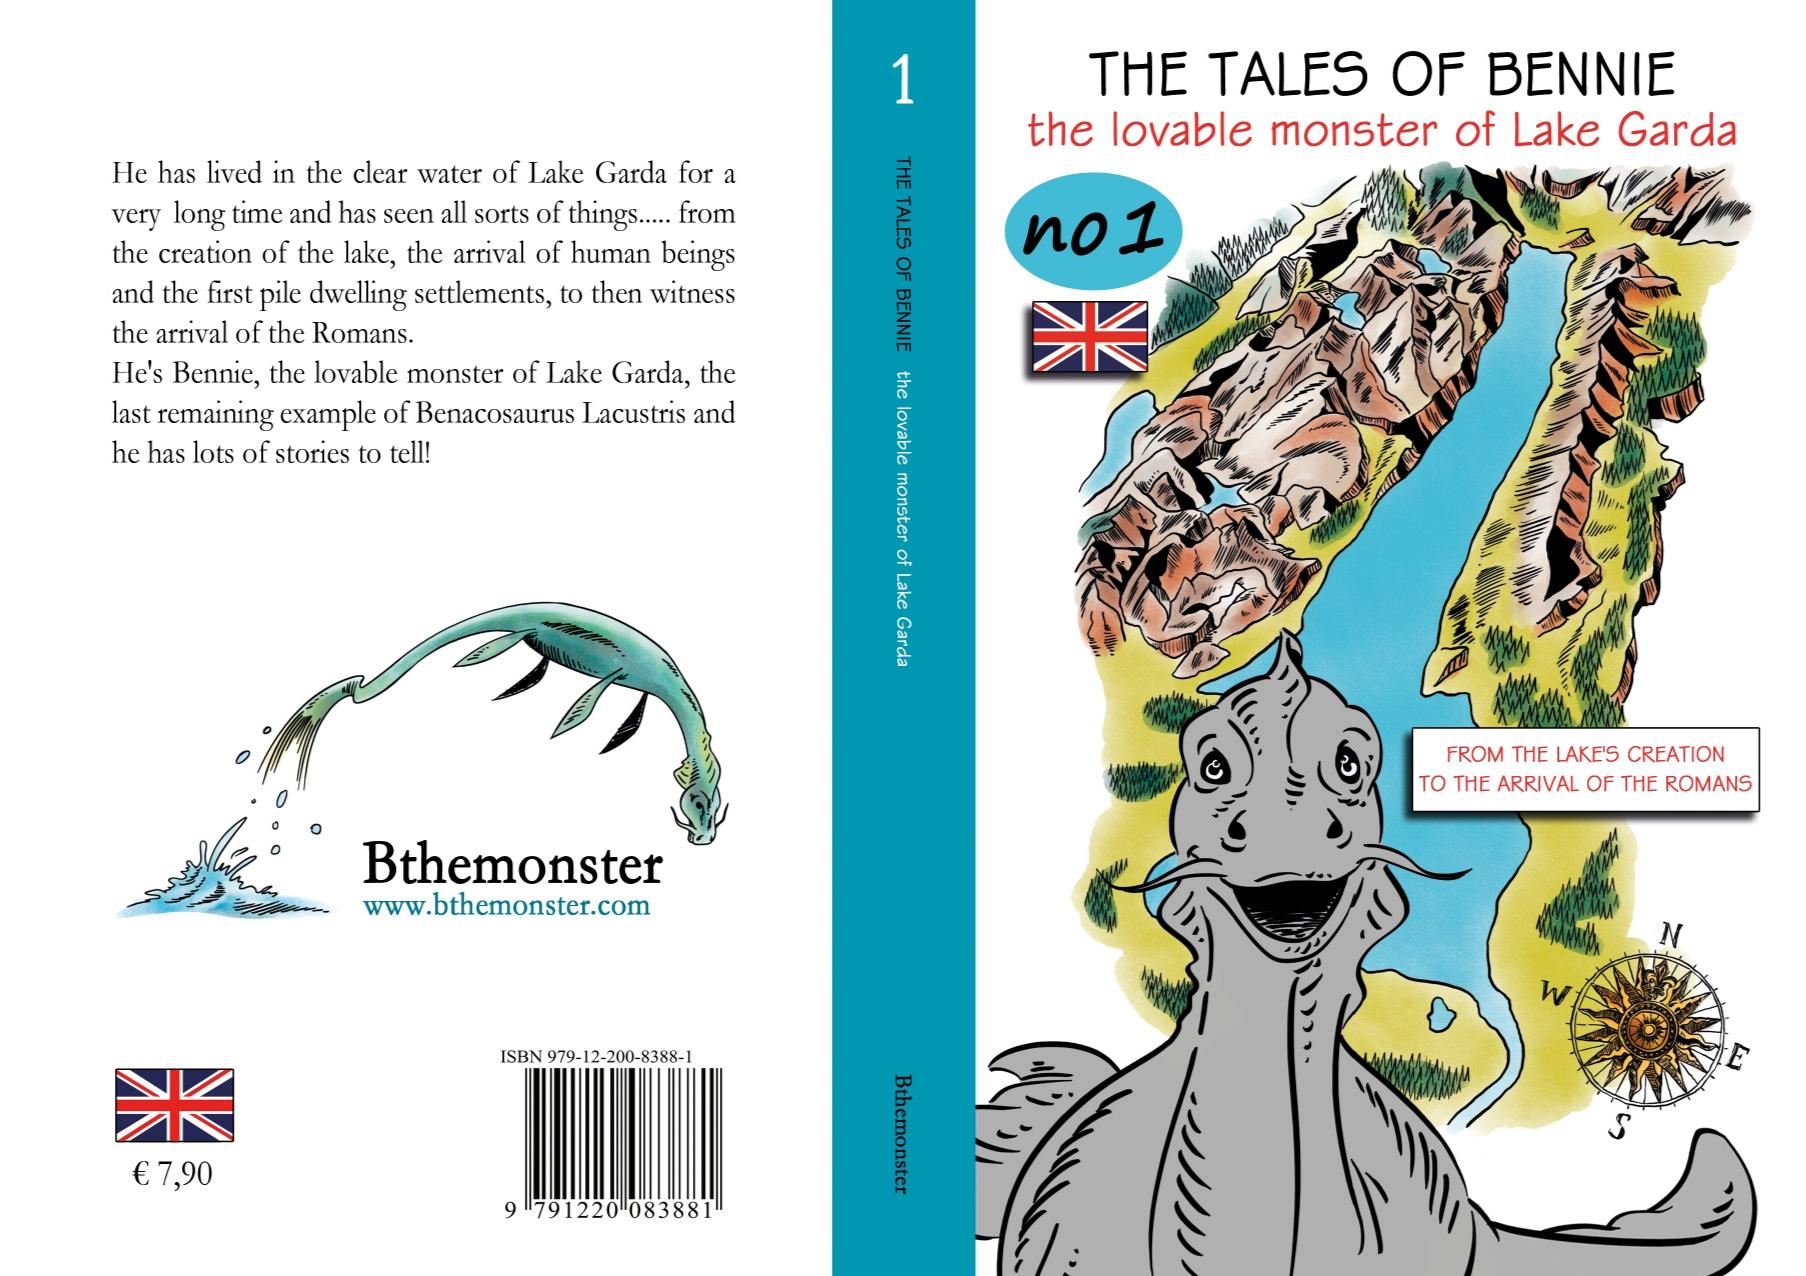 Epub Libro - Racconti di Bennie Vol.1 - Inglese. Bthemonster